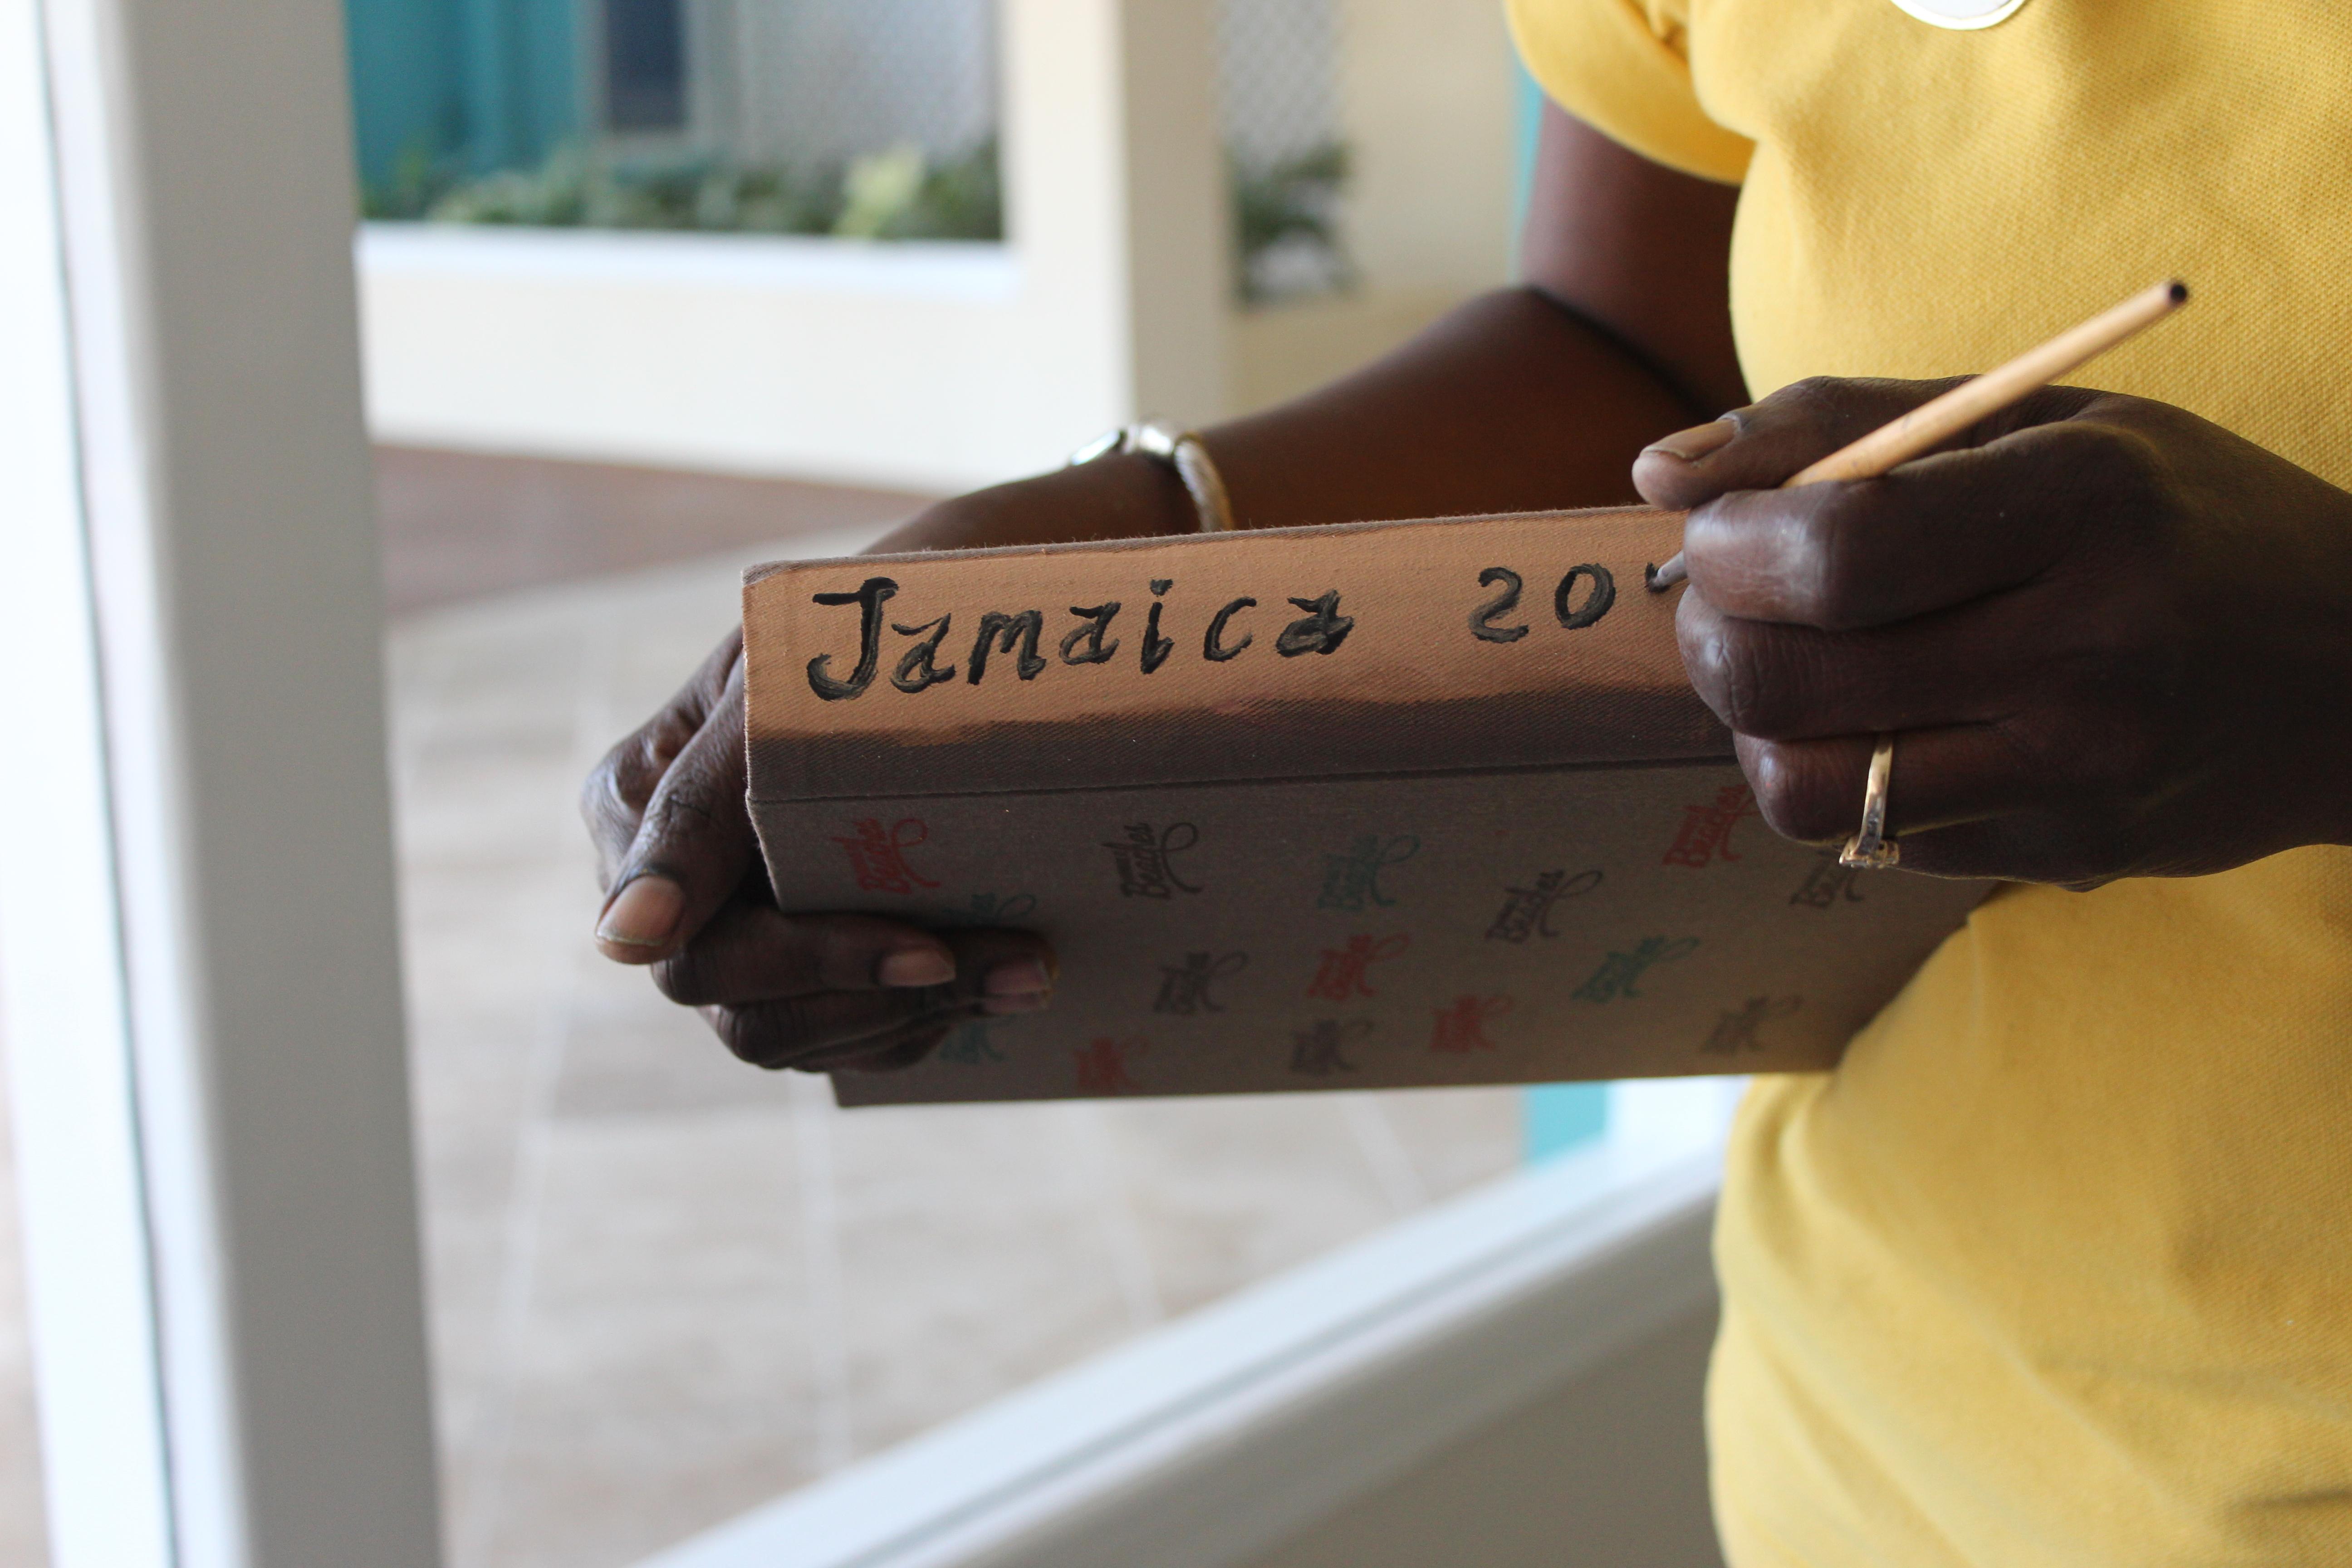 jamaica scapbook sign